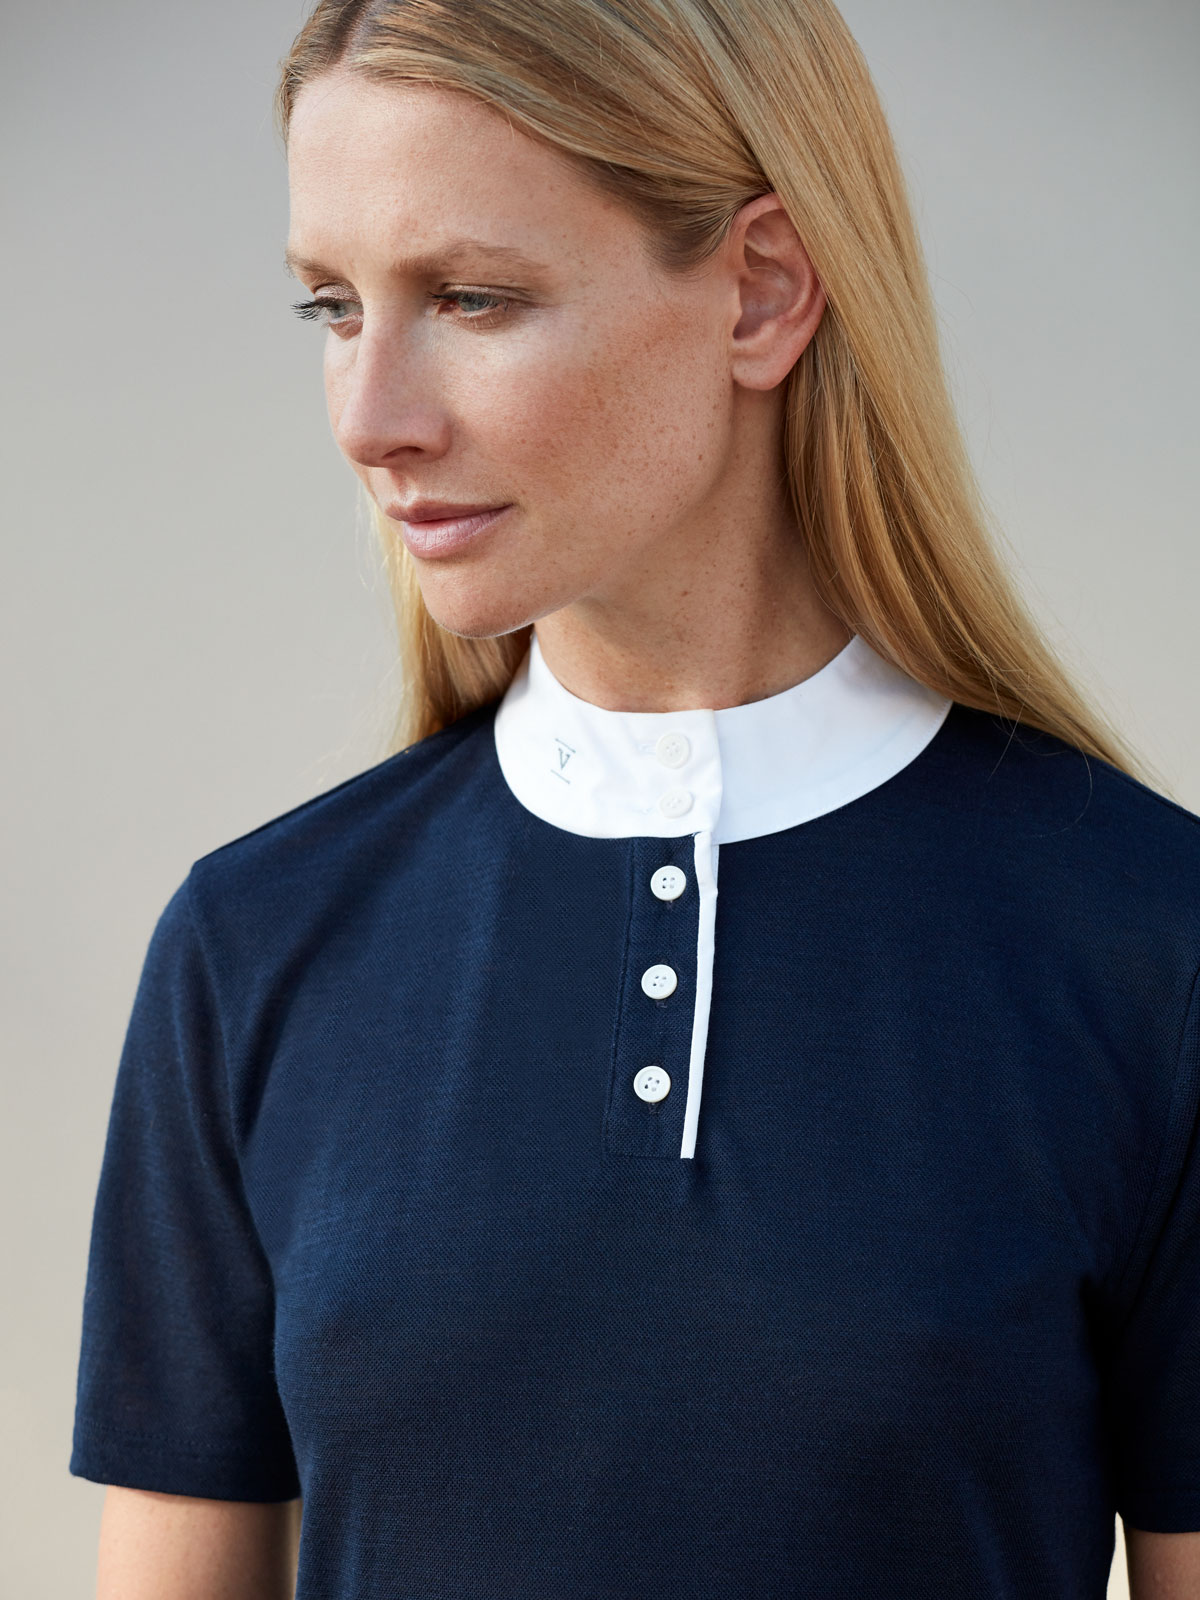 VALOR pure merino extrafine shirt EPPAN navy